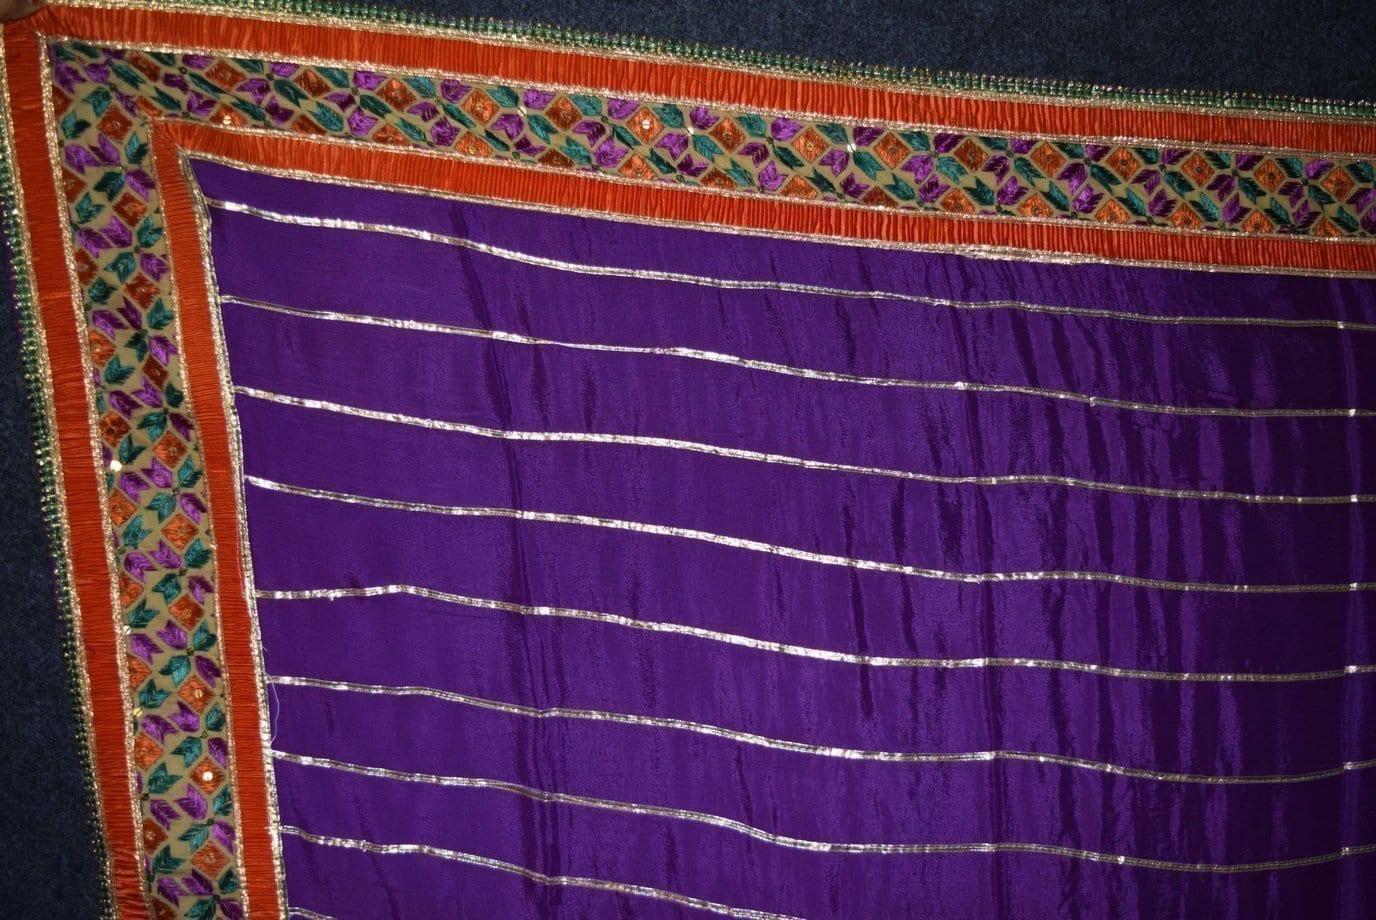 Glazed Cotton Hand Embroidered Salwar kameez suit CHINON DUPATTA set F0659 2